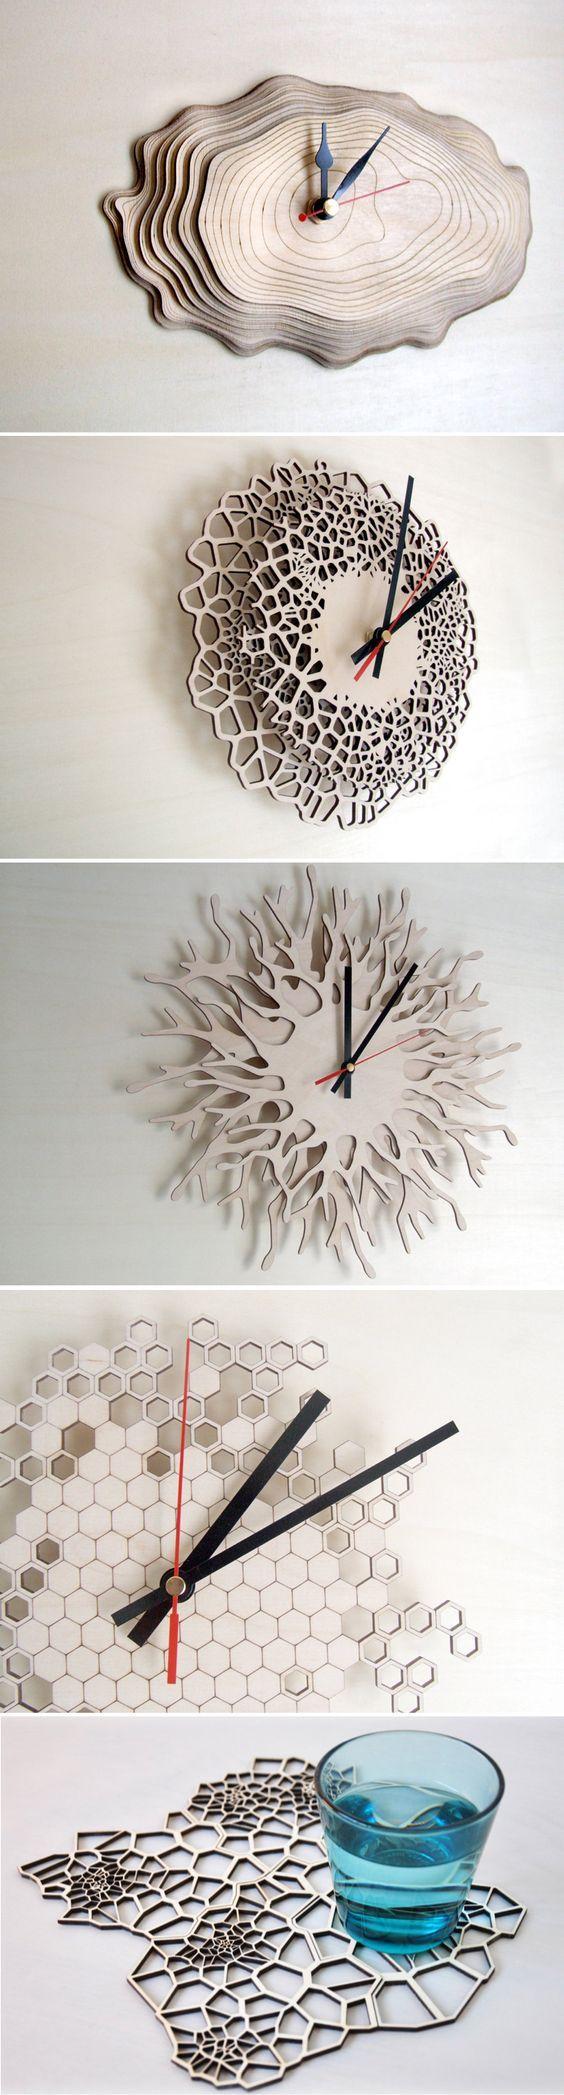 Best 25 wall clock design ideas on pinterest designer wall wall clock amipublicfo Choice Image